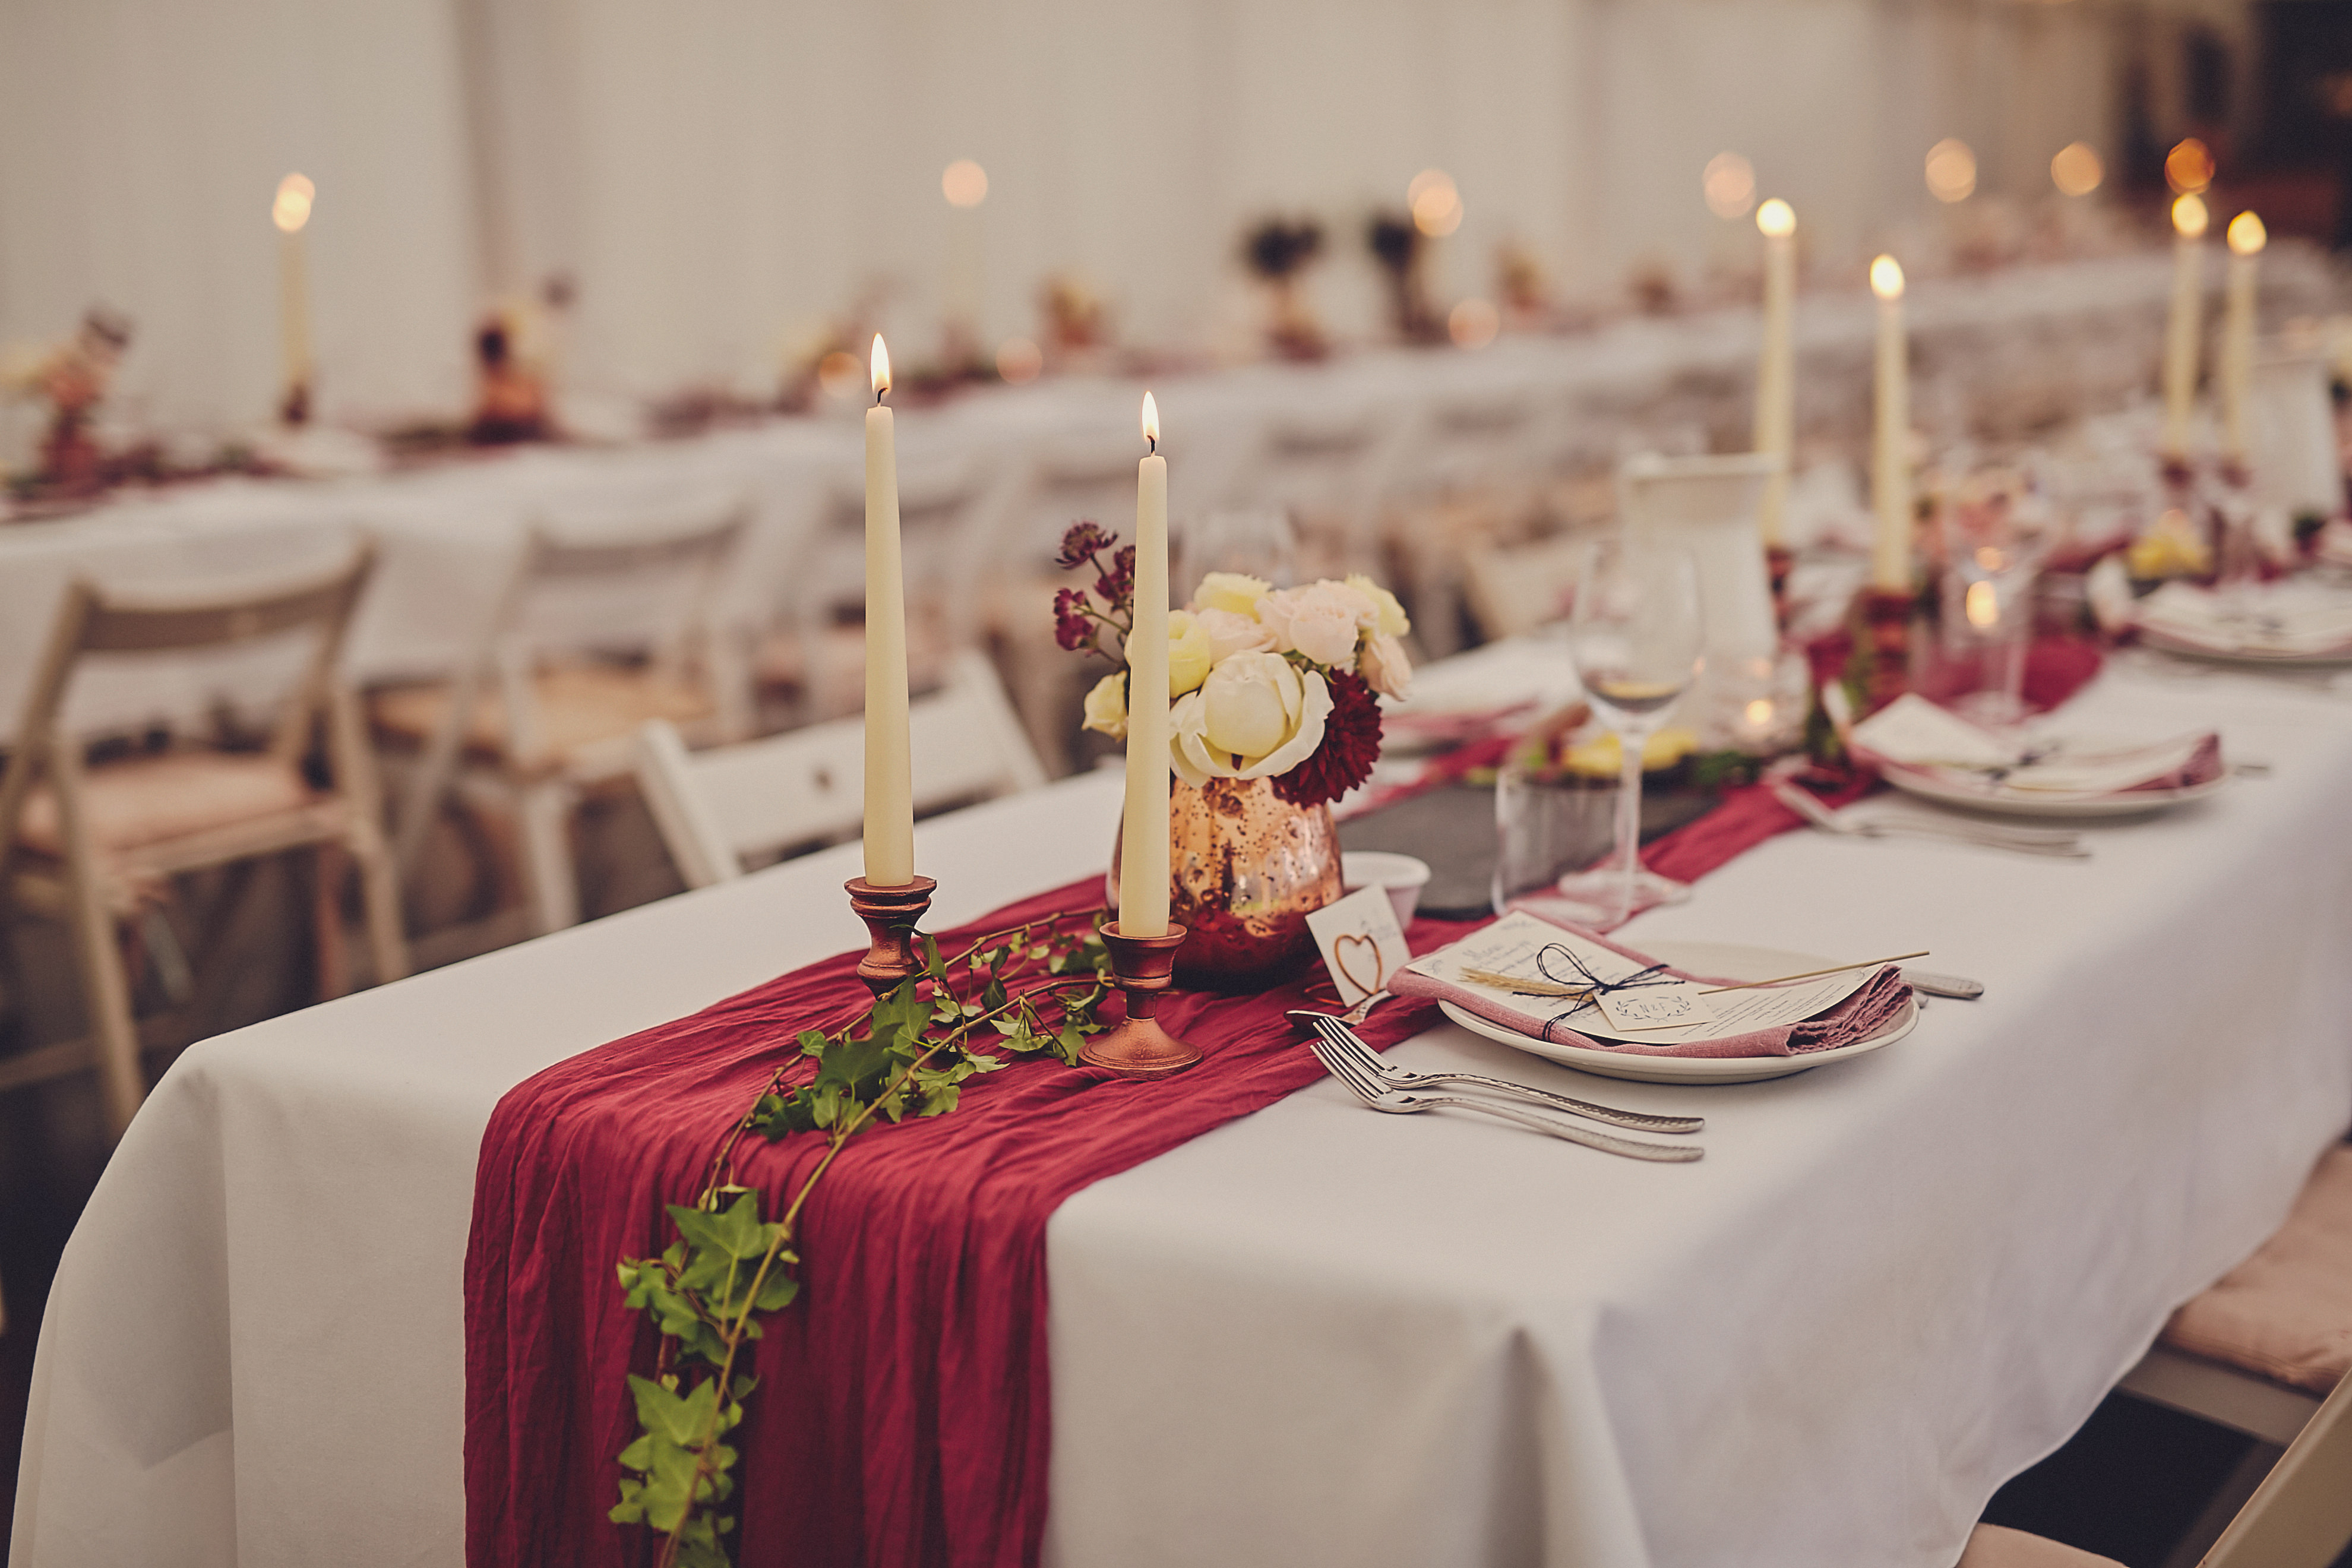 Cloughjordan House weddding123 - Cloughjordan House Wedding - Alternative Venue